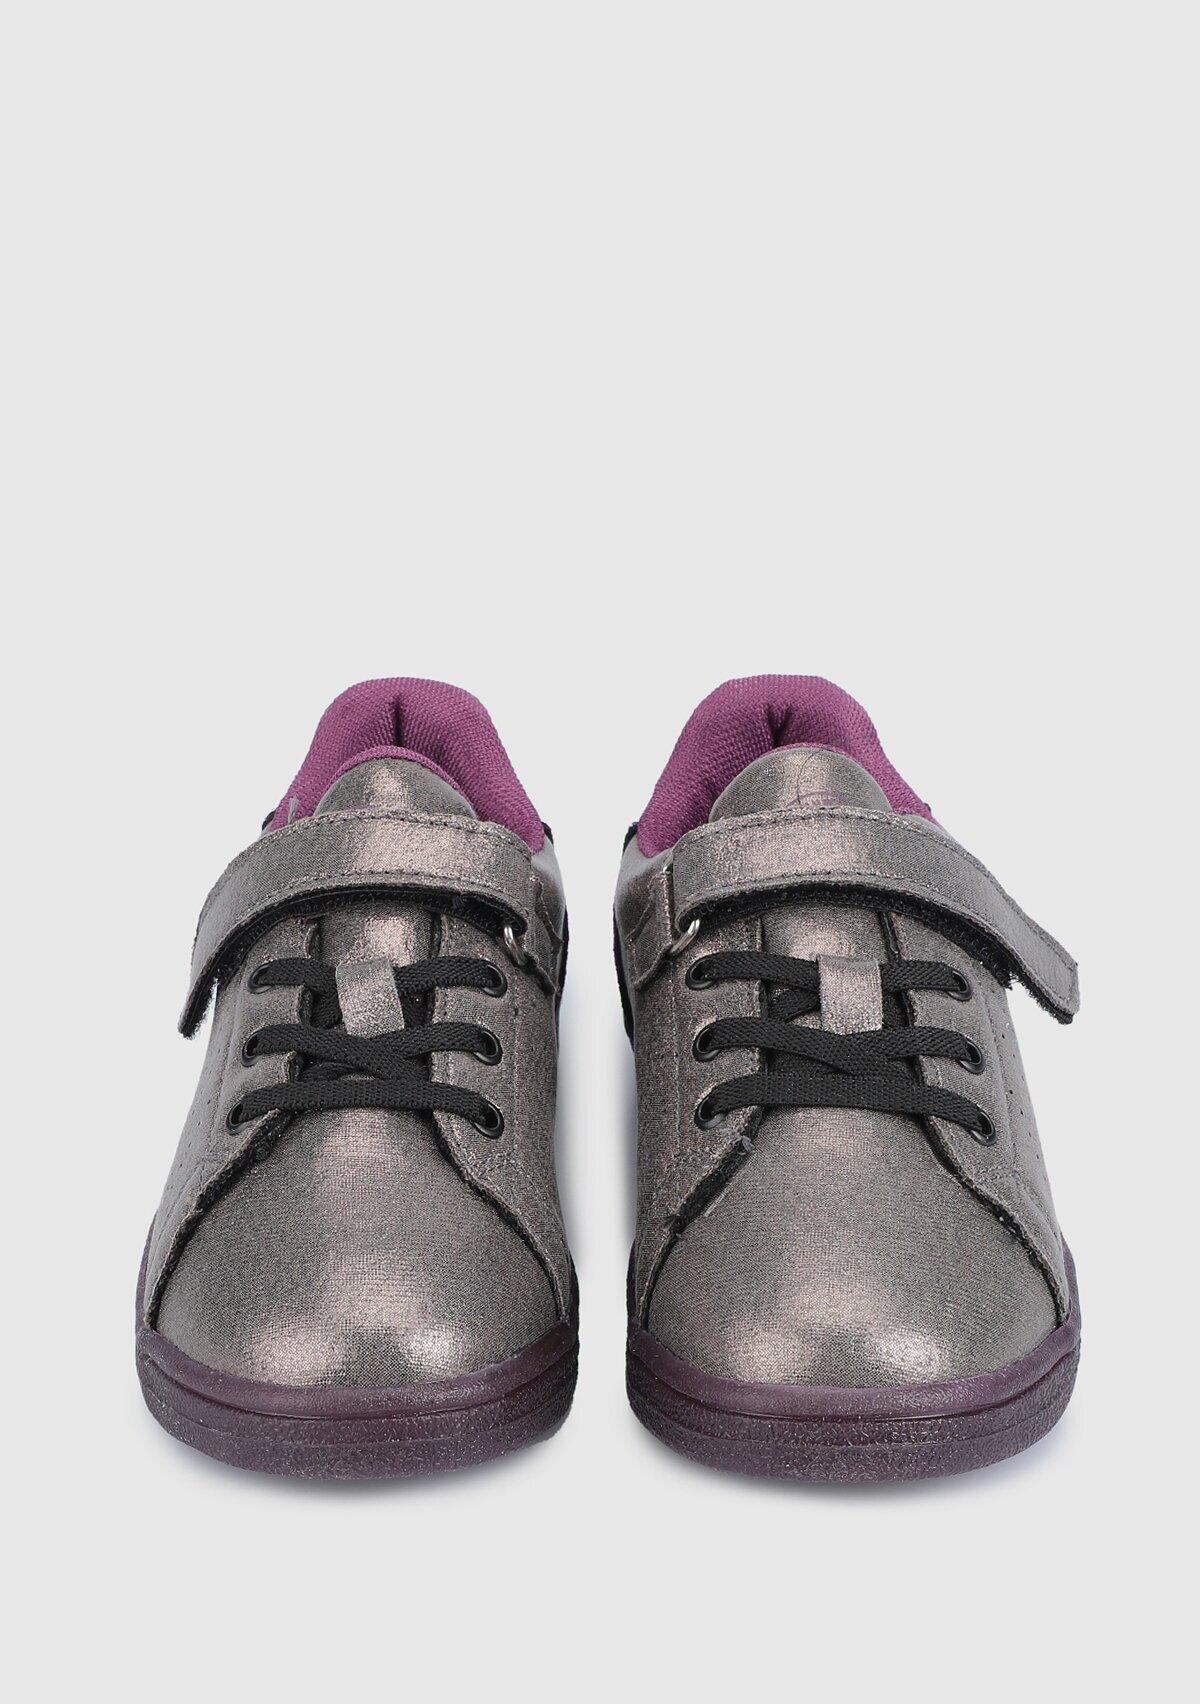 resm Hml Busan Shıny Jr Gri Kız Çocuk Sneaker 212669